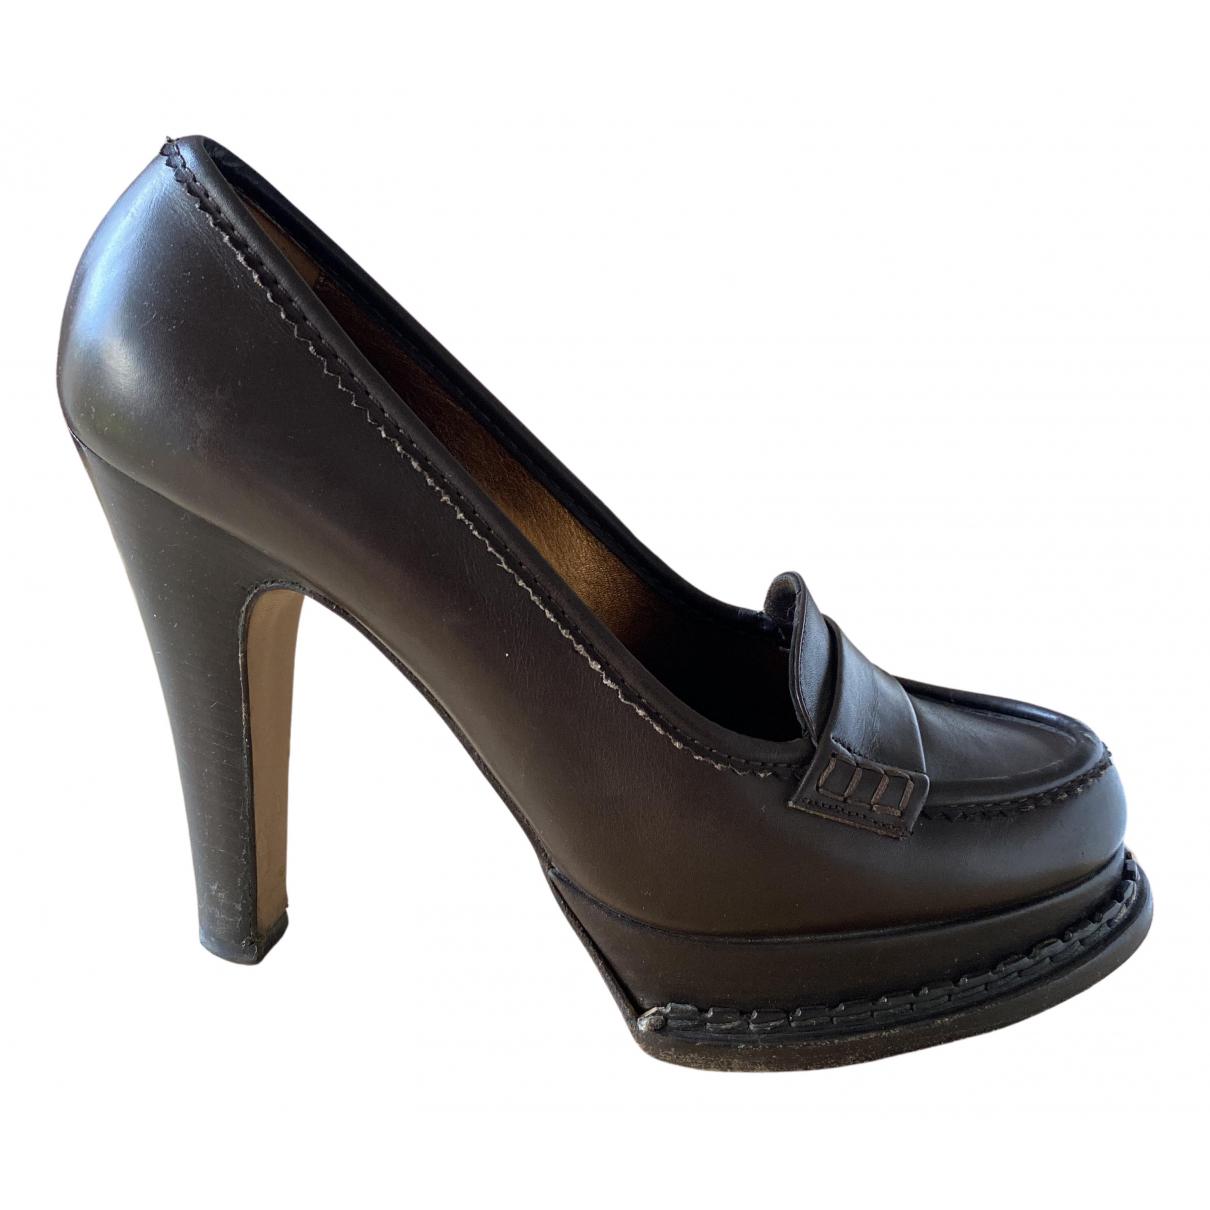 Yves Saint Laurent N Brown Leather Heels for Women 39.5 EU